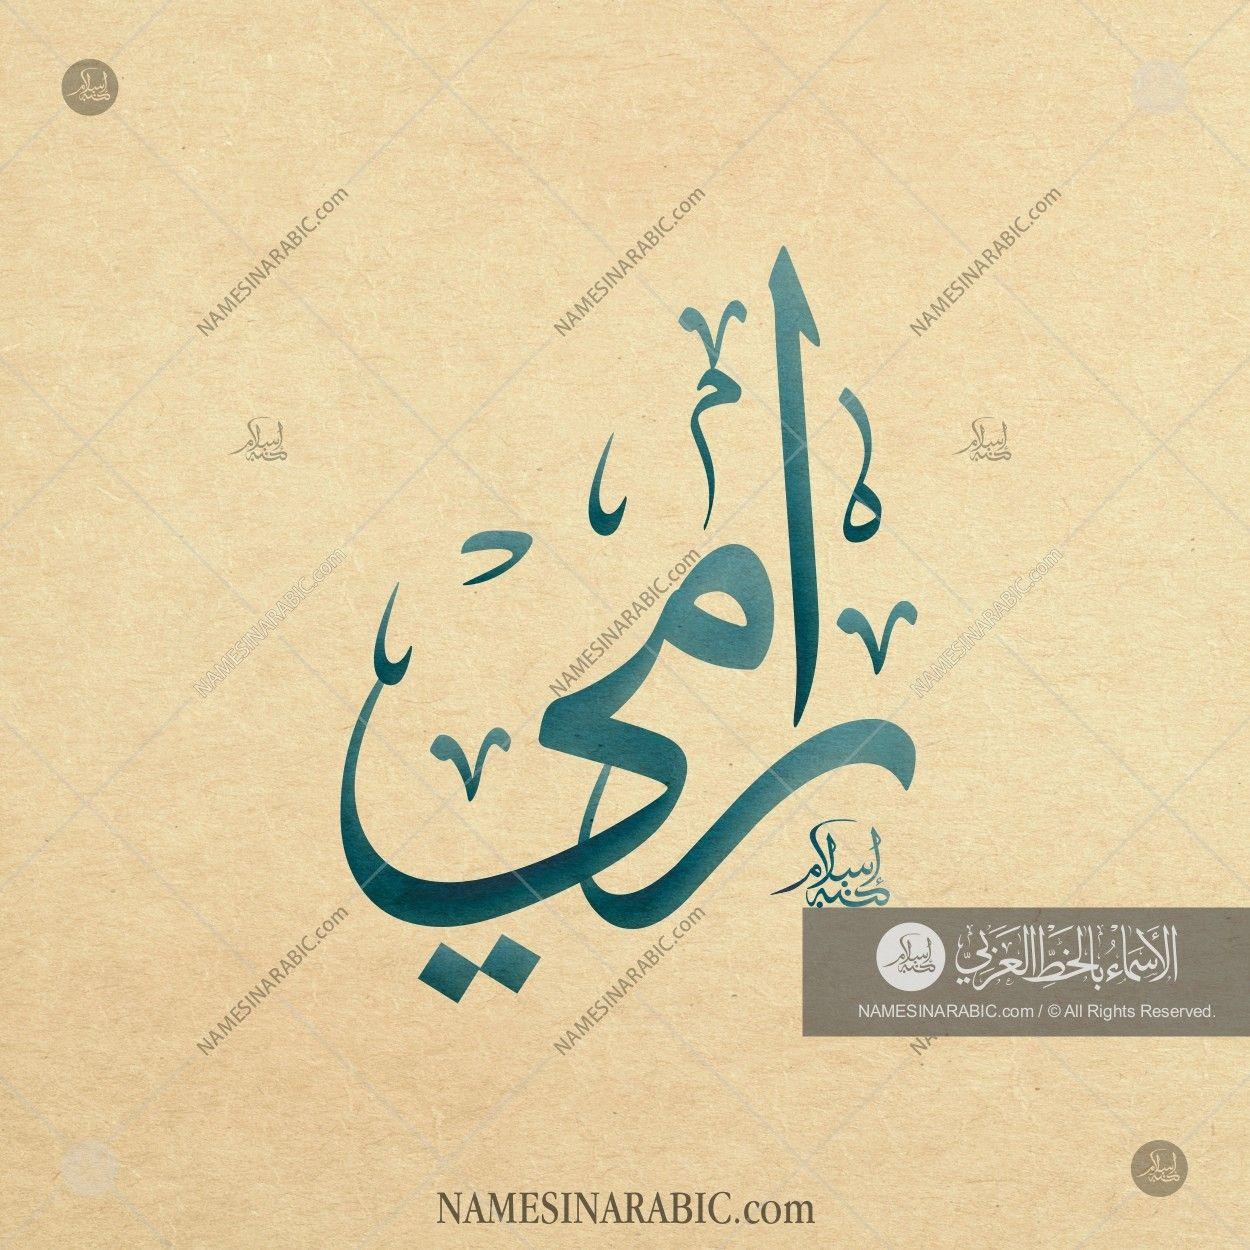 Rami رامي Names In Arabic Calligraphy Name 3452 Calligraphy Name Arabic Calligraphy Design Arabic Calligraphy